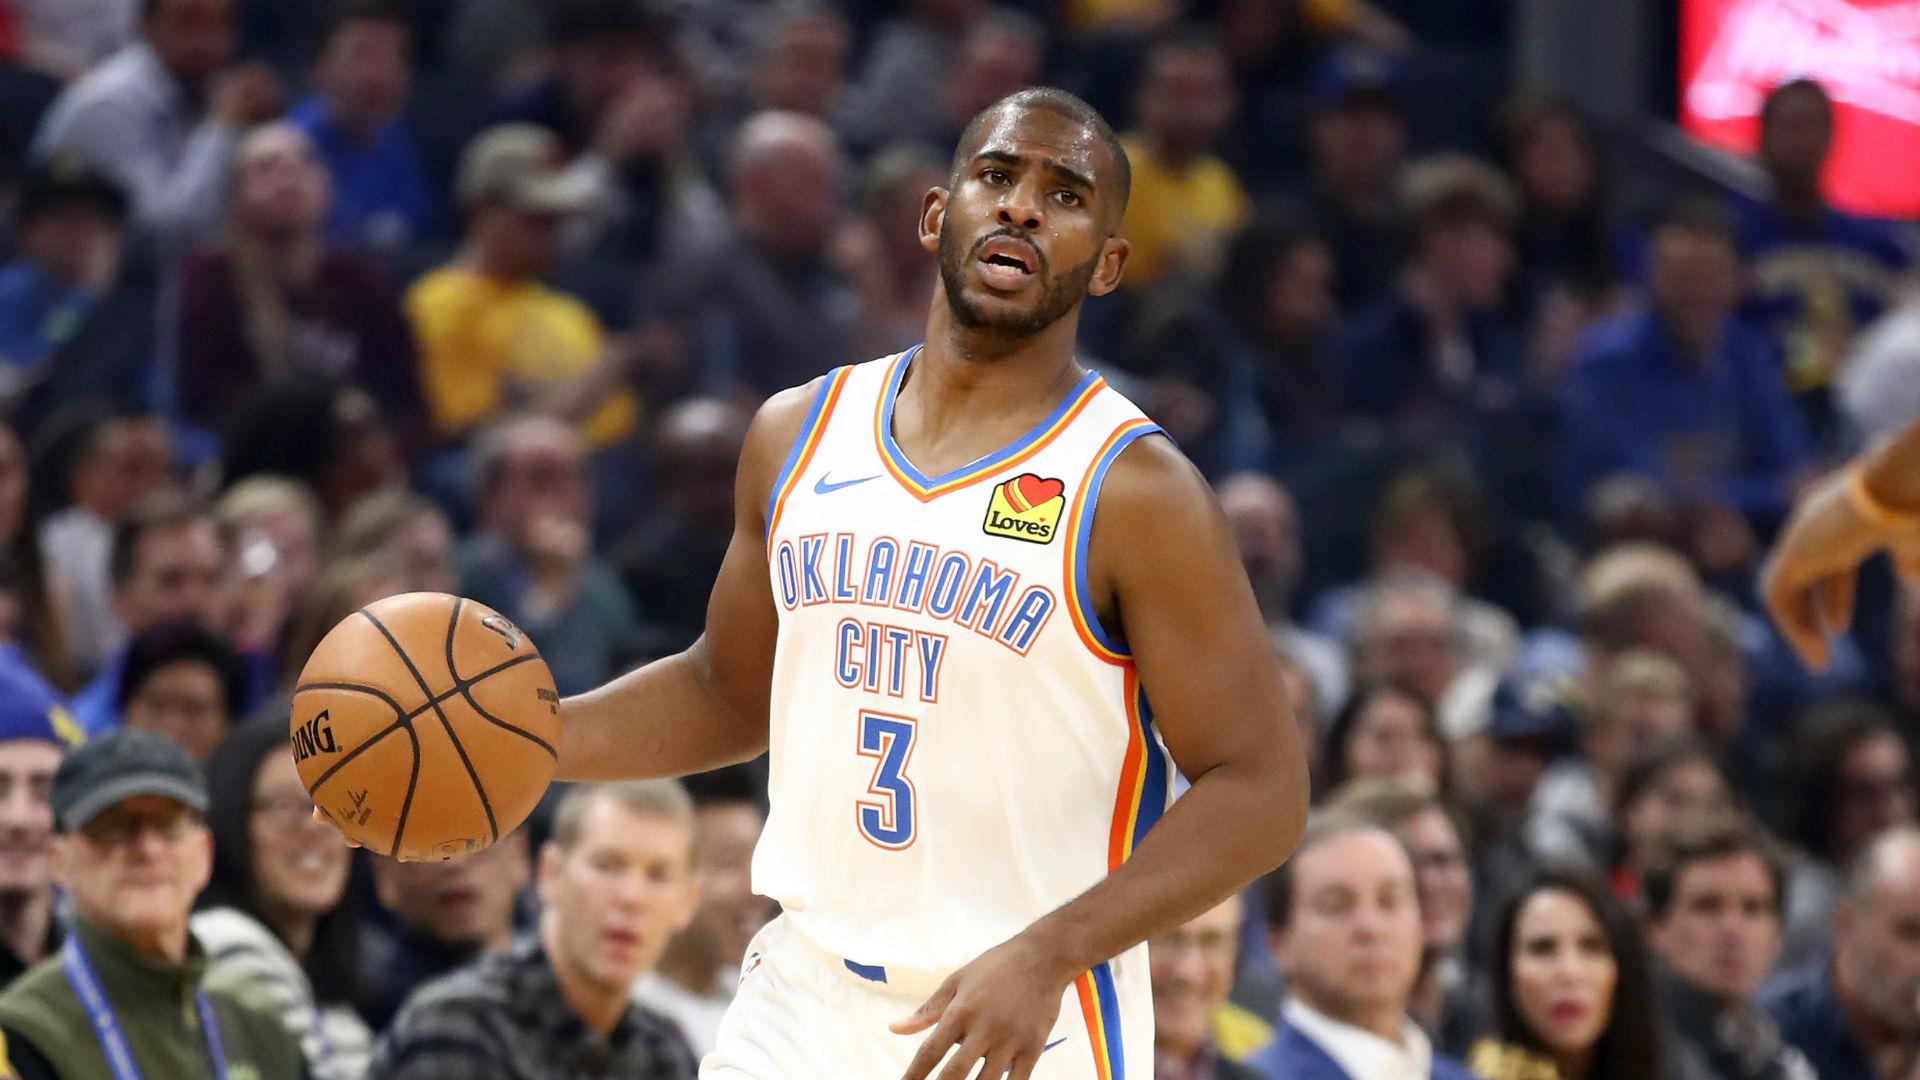 NBA players 'want to play bad,' says Chris Paul